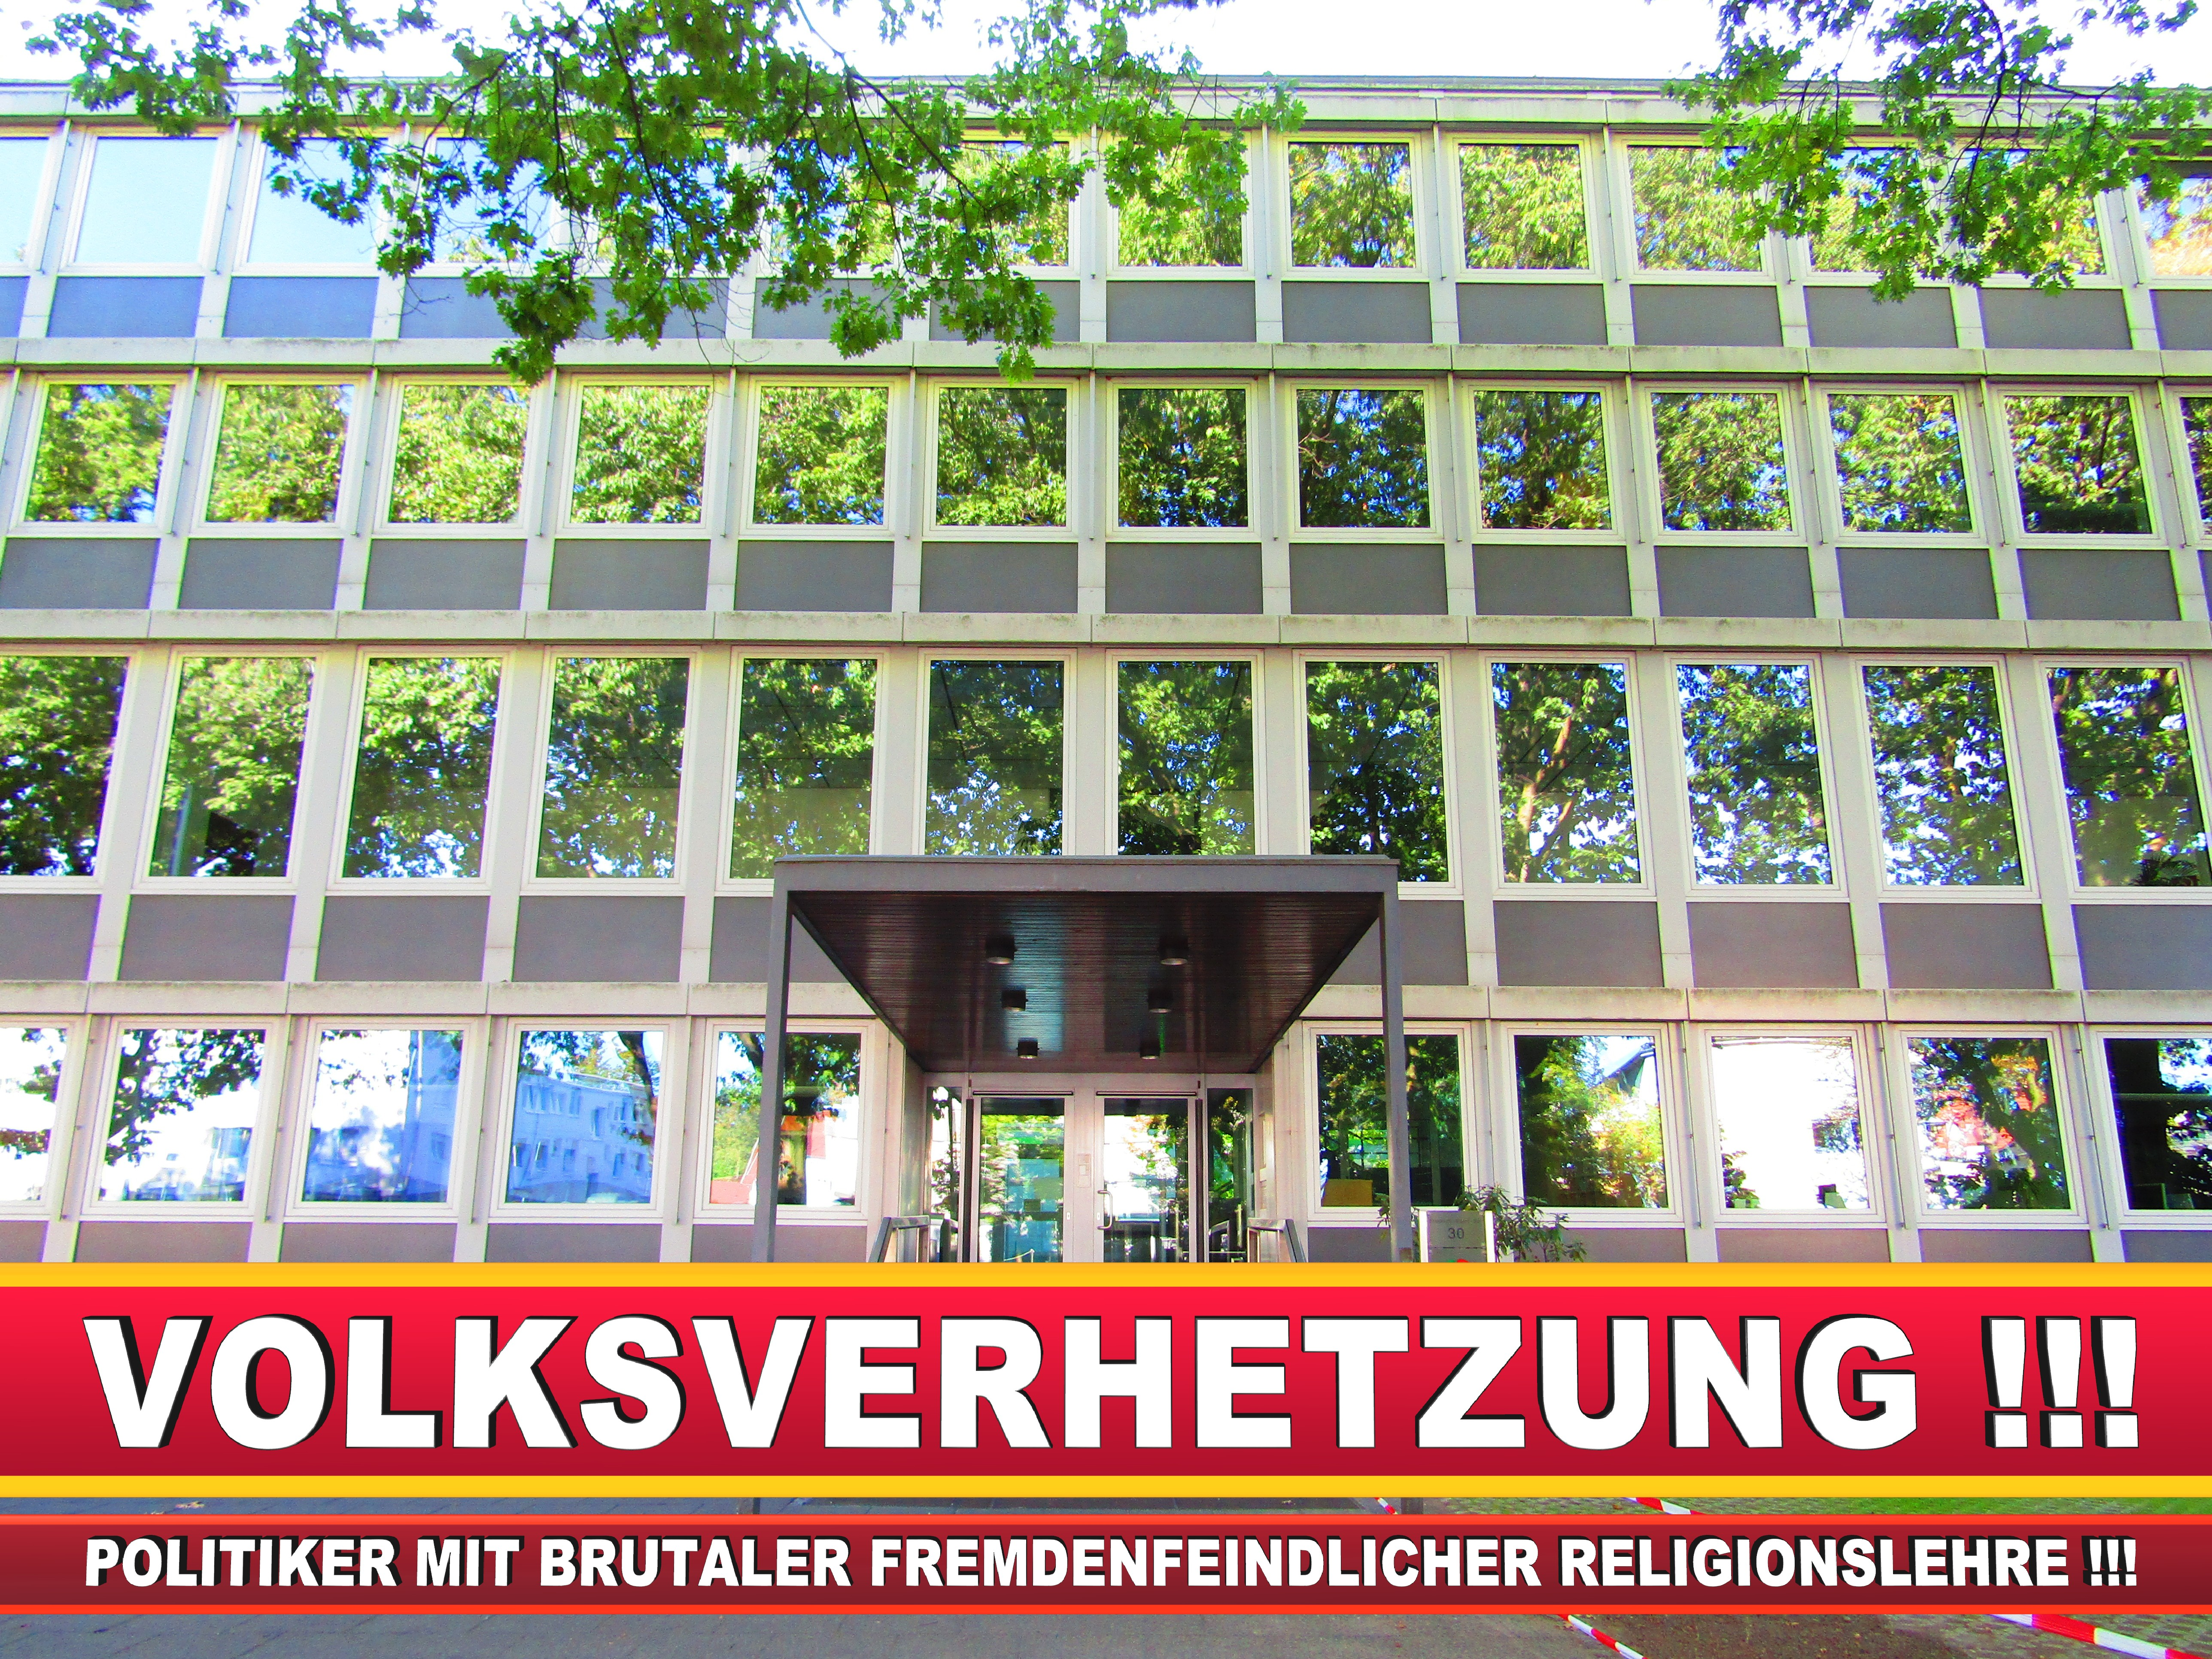 AMTSGERICHT GÜTERSLOH (1) LANDTAGSWAHL BUNDESTAGSWAHL BÜRGERMEISTERWAHL